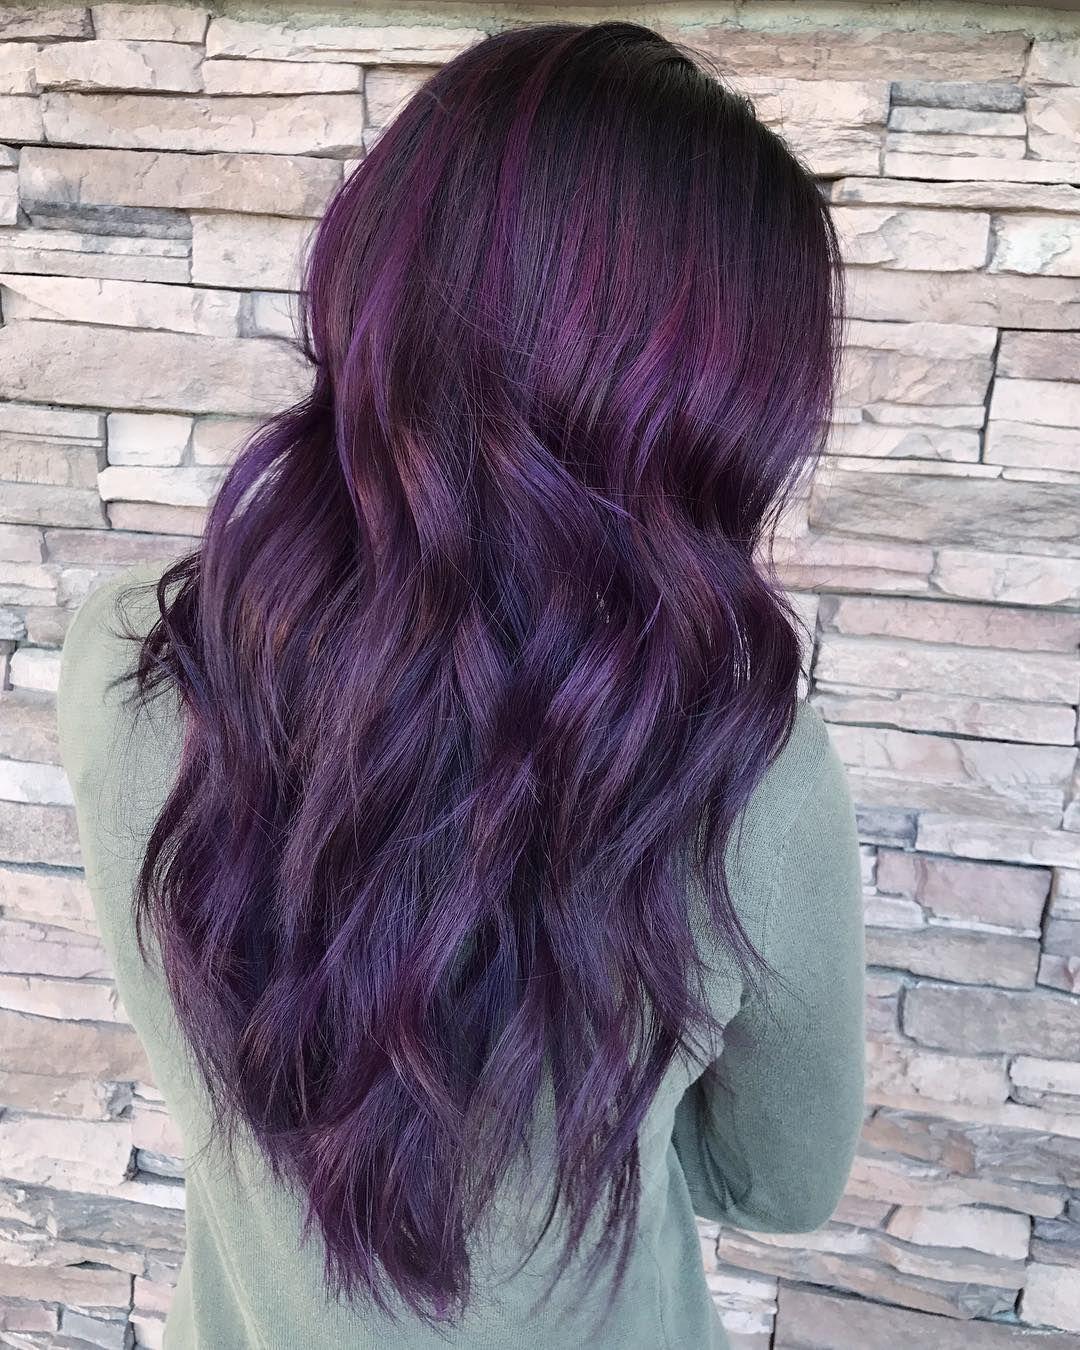 Instagram crazy colors uc pinterest instagram hair coloring